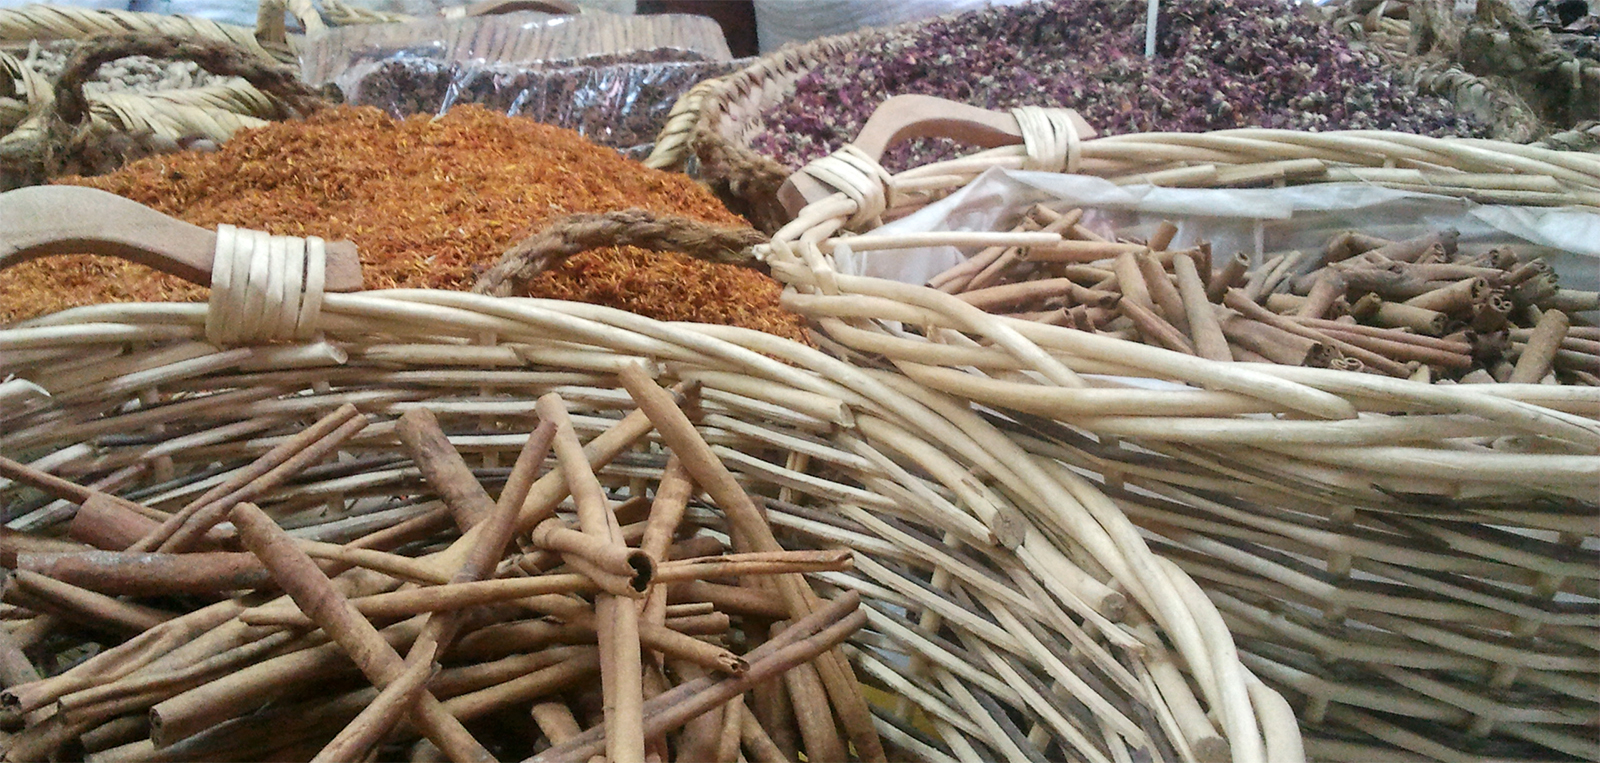 Elbabour Spice shop Nazareth